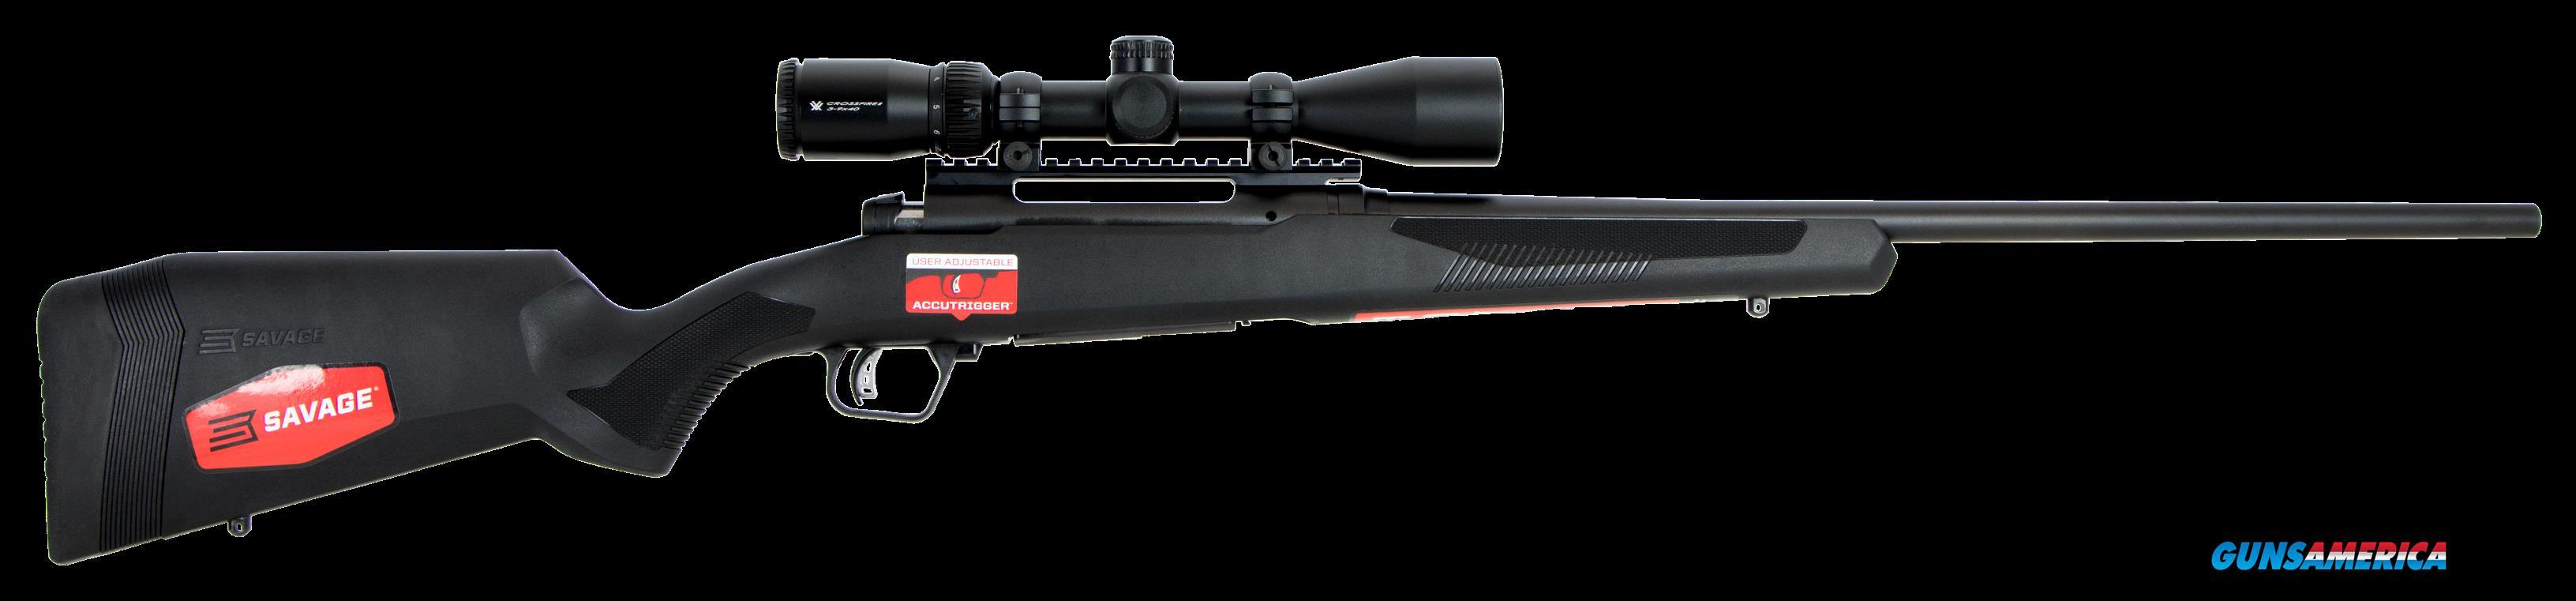 Savage 10-110, Sav 57319 110 Apex Hunter Xp 243 Win   Lh   Vortex  Guns > Pistols > 1911 Pistol Copies (non-Colt)